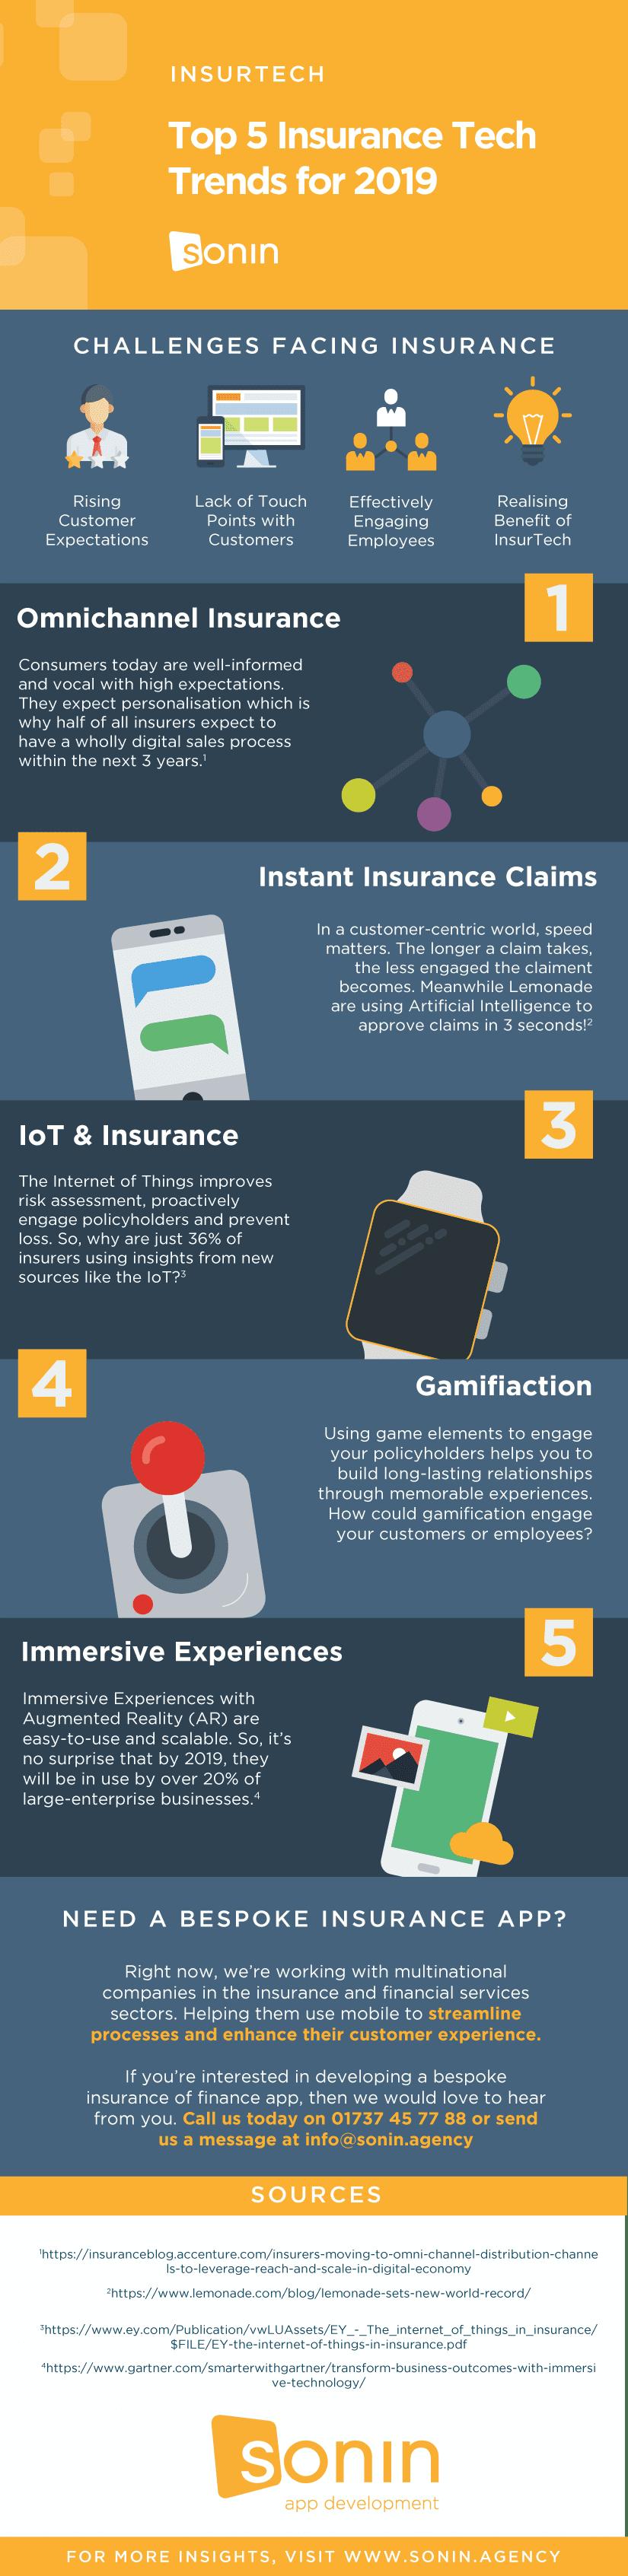 Top 5 Insurance Tech Trends for 2019 Sonin App Development